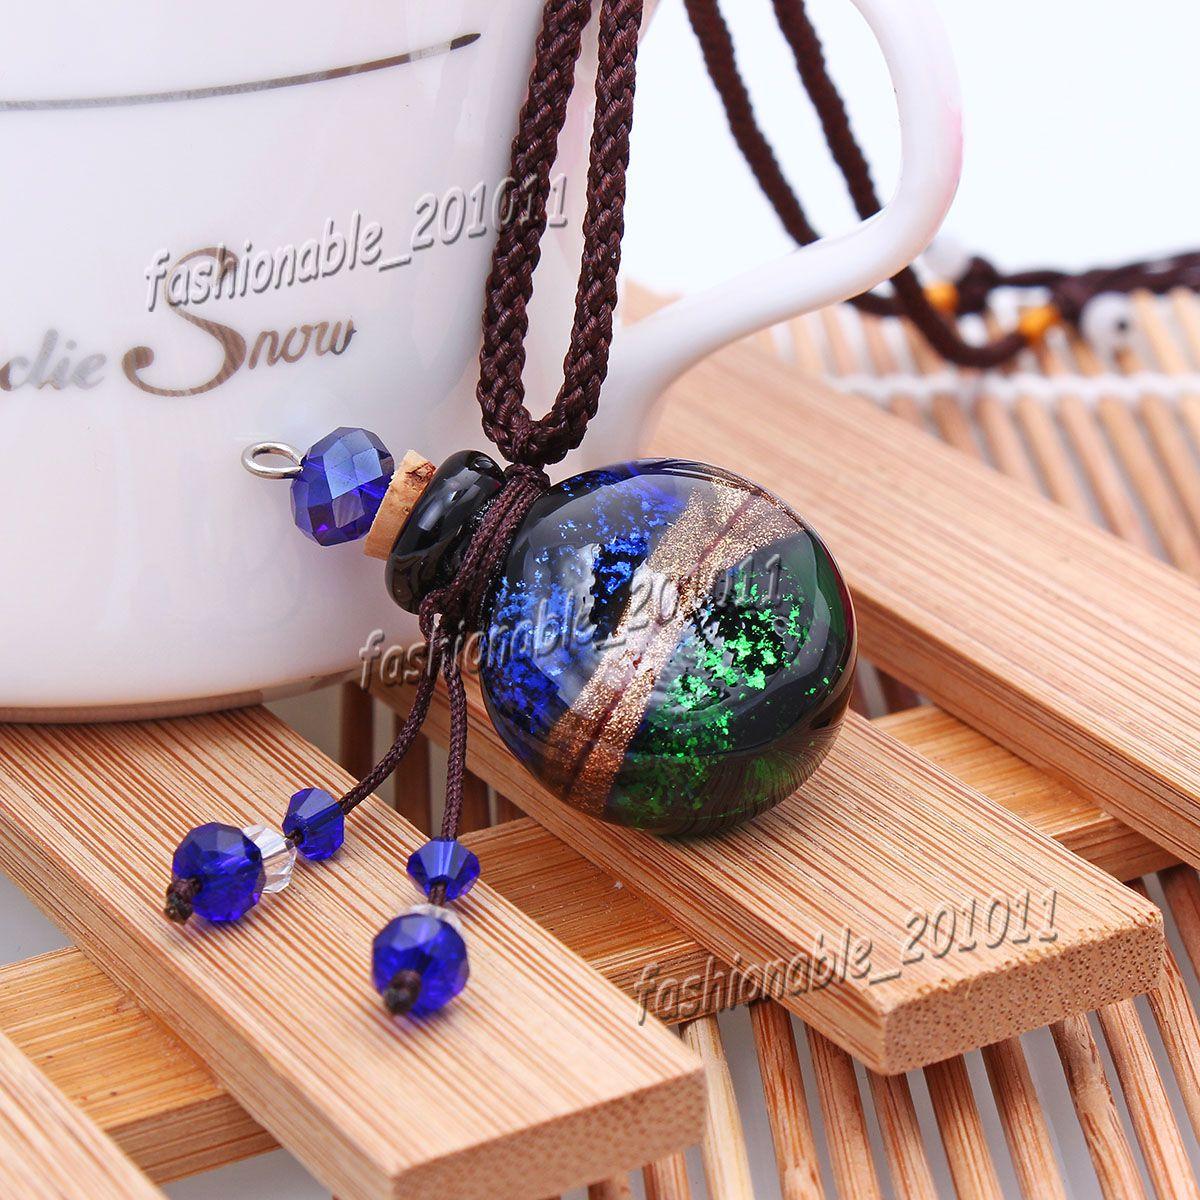 Round Glass essential oil diffuser necklaces flowers vial pendant necklace aromatherapy pendant vintage perfume bottle pendant necklaces OB8